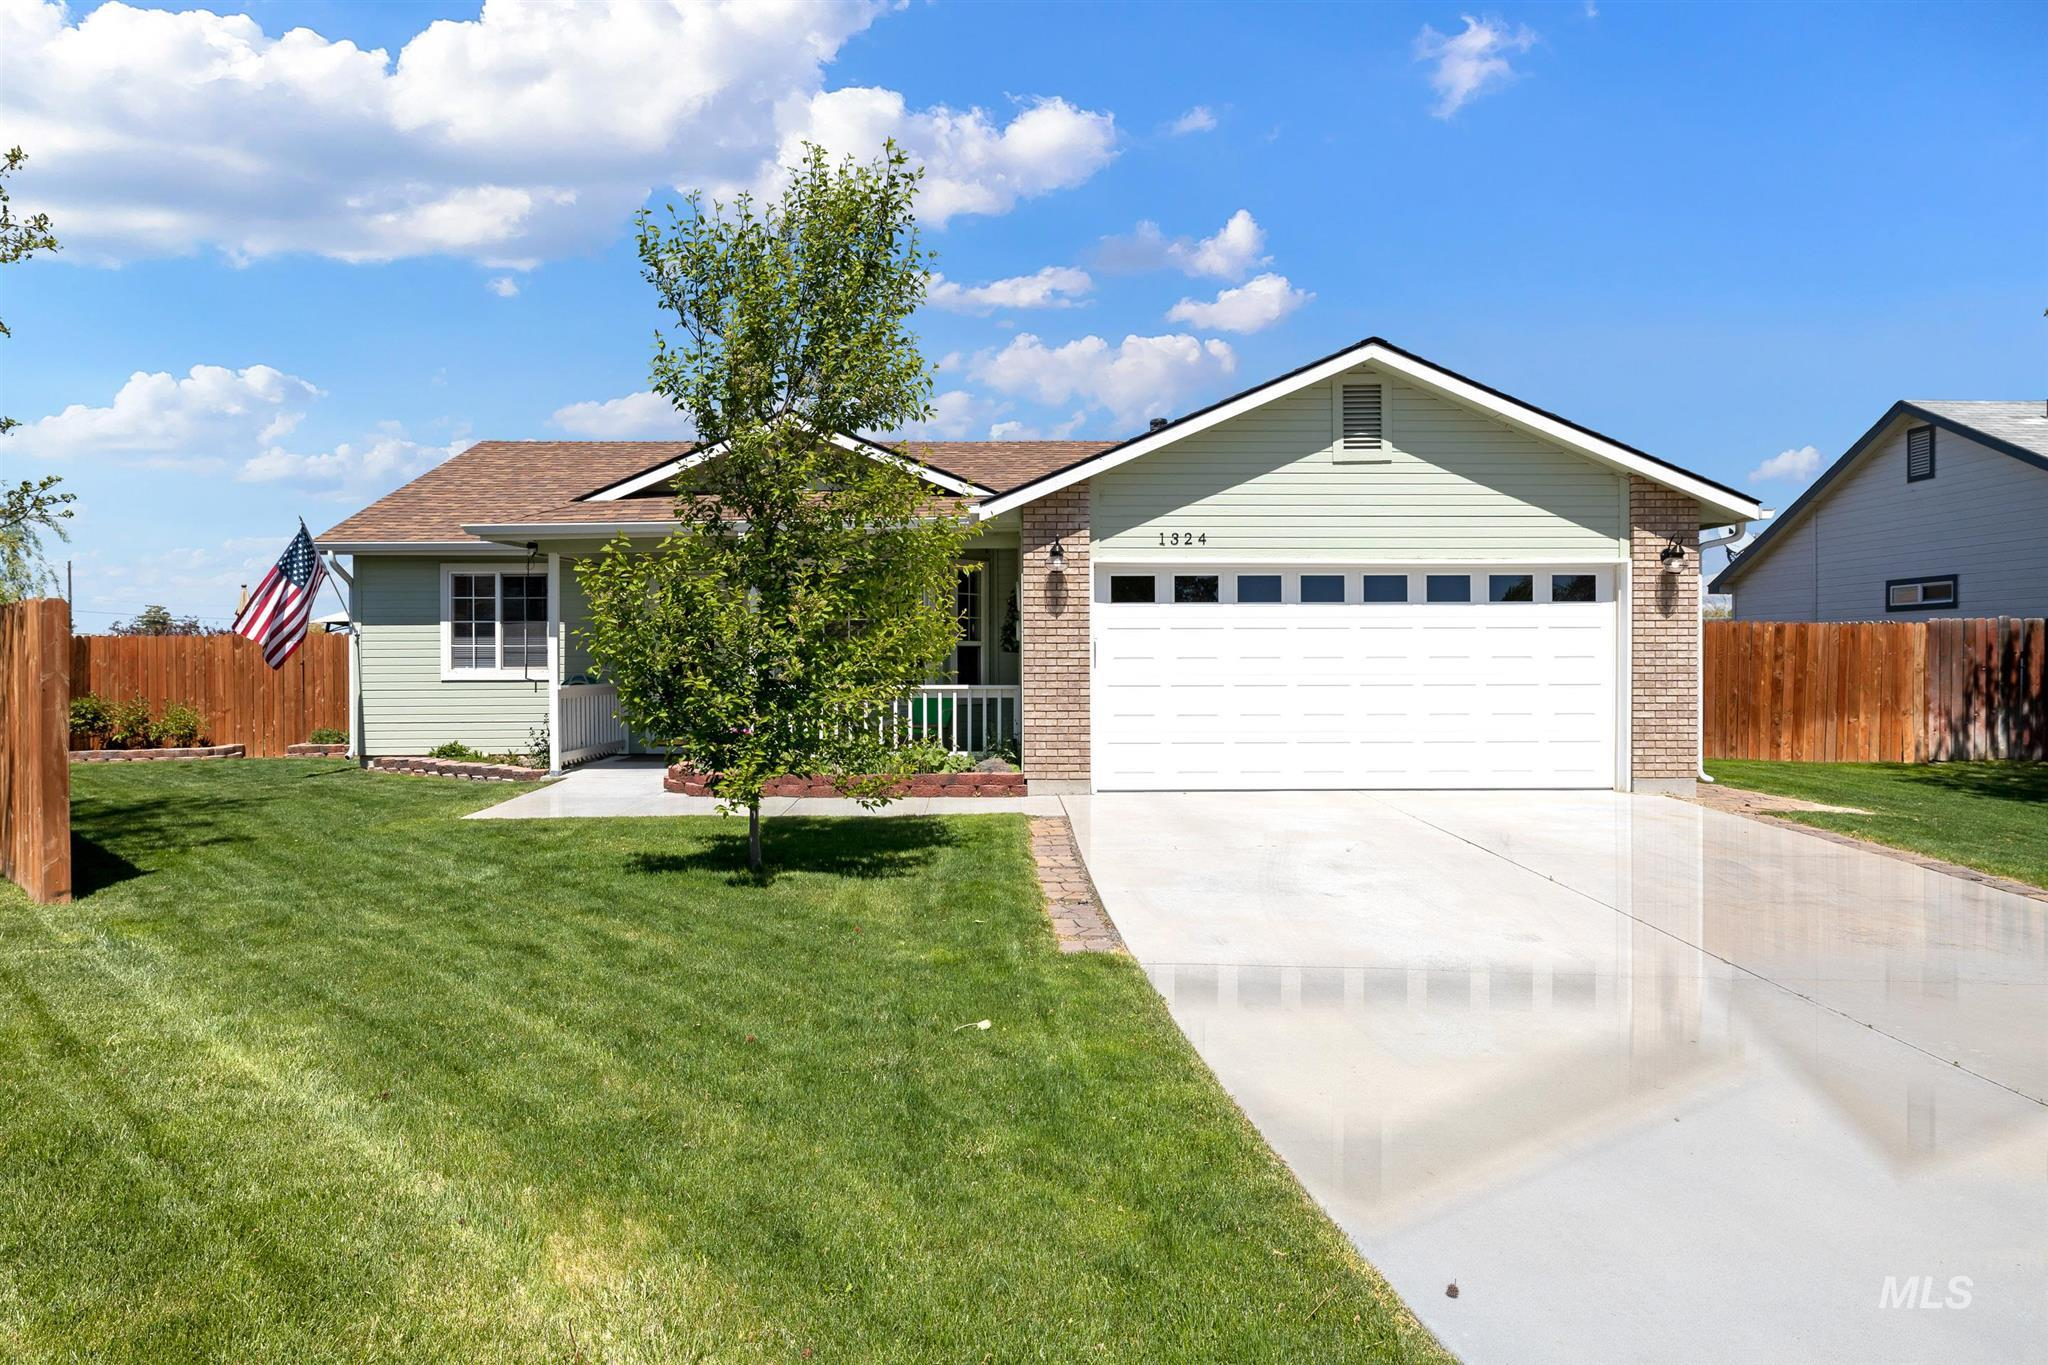 1324 W ASH PL Property Photo - Kuna, ID real estate listing